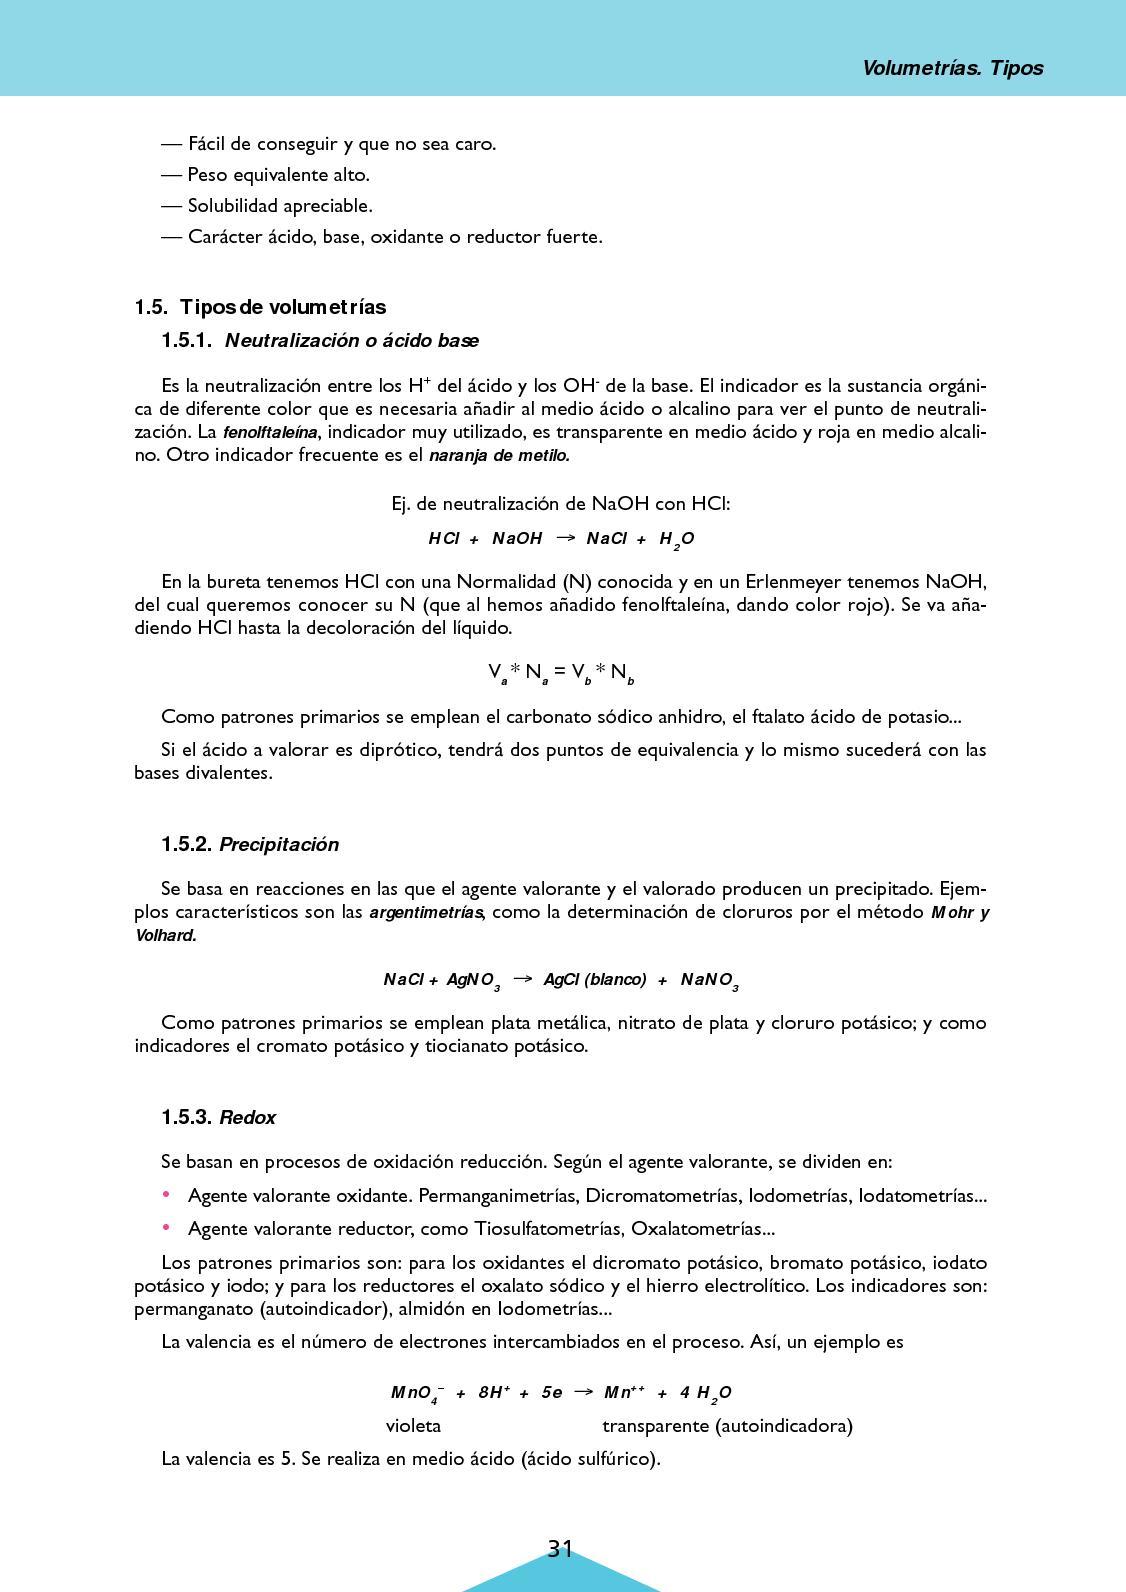 PRÁCTICAS QUÍMICA INSTITUTO - CALAMEO Downloader